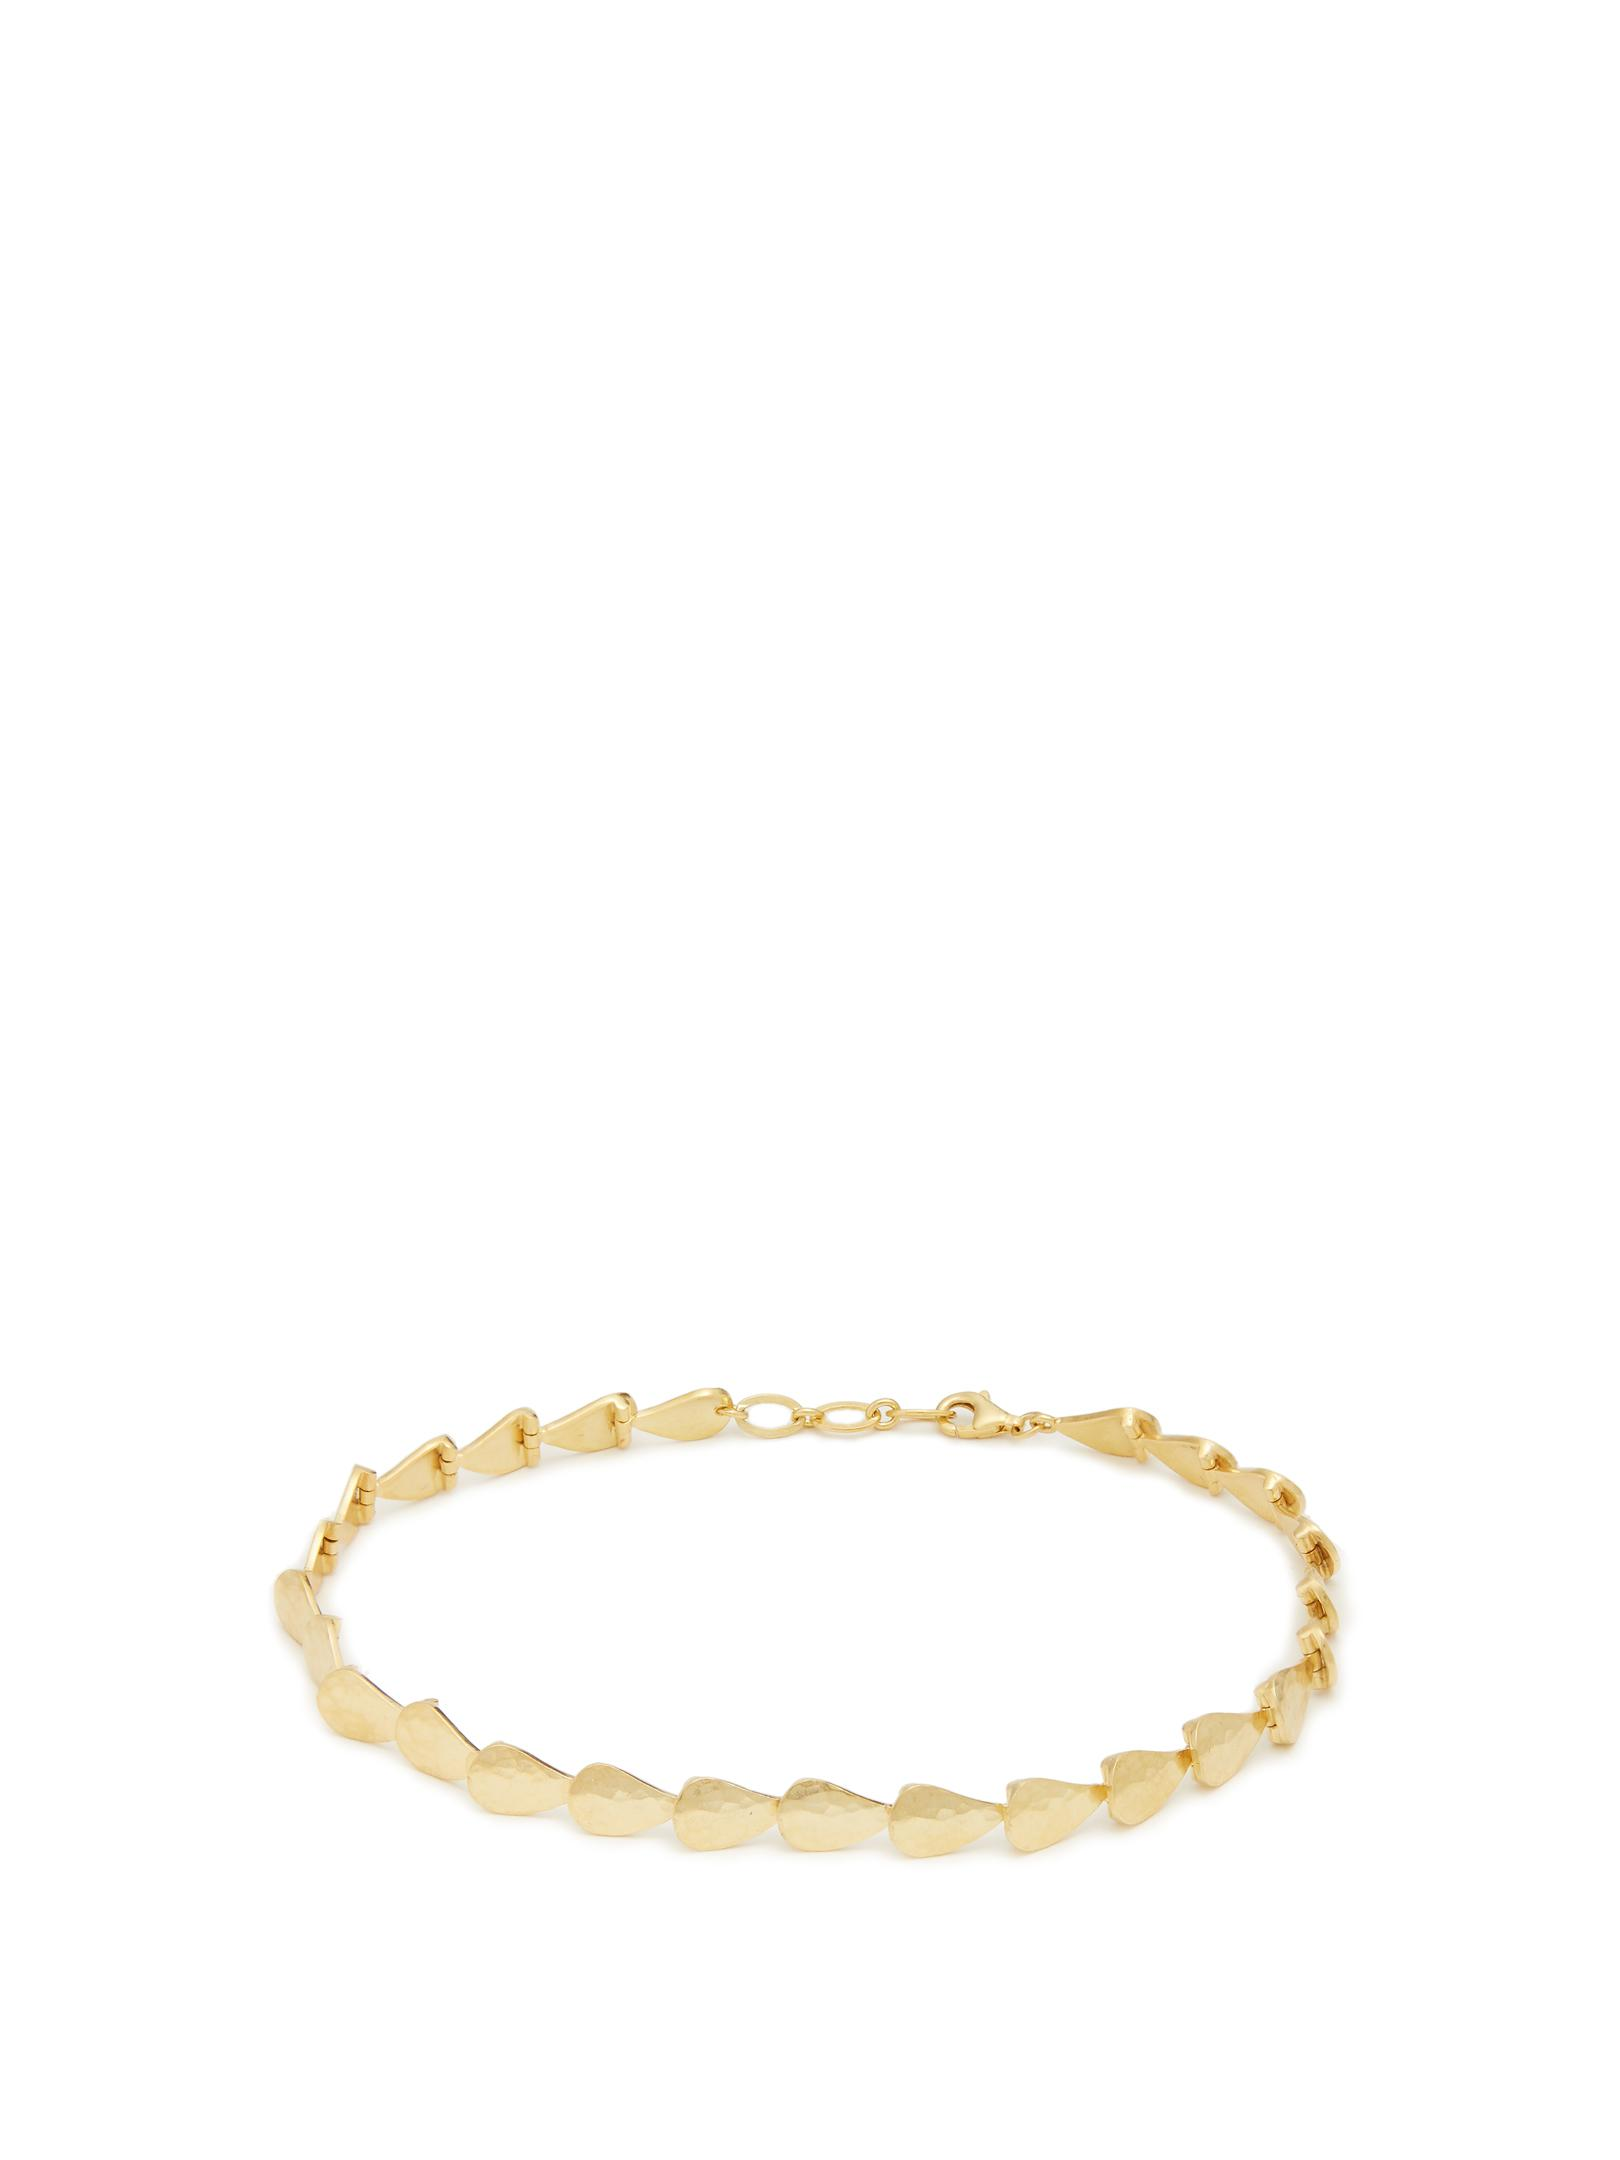 braidedleathercharmbracelet online anklet men bracelets braided us bracelet jewelry leather store versace bangle accessories en charm for fashion women